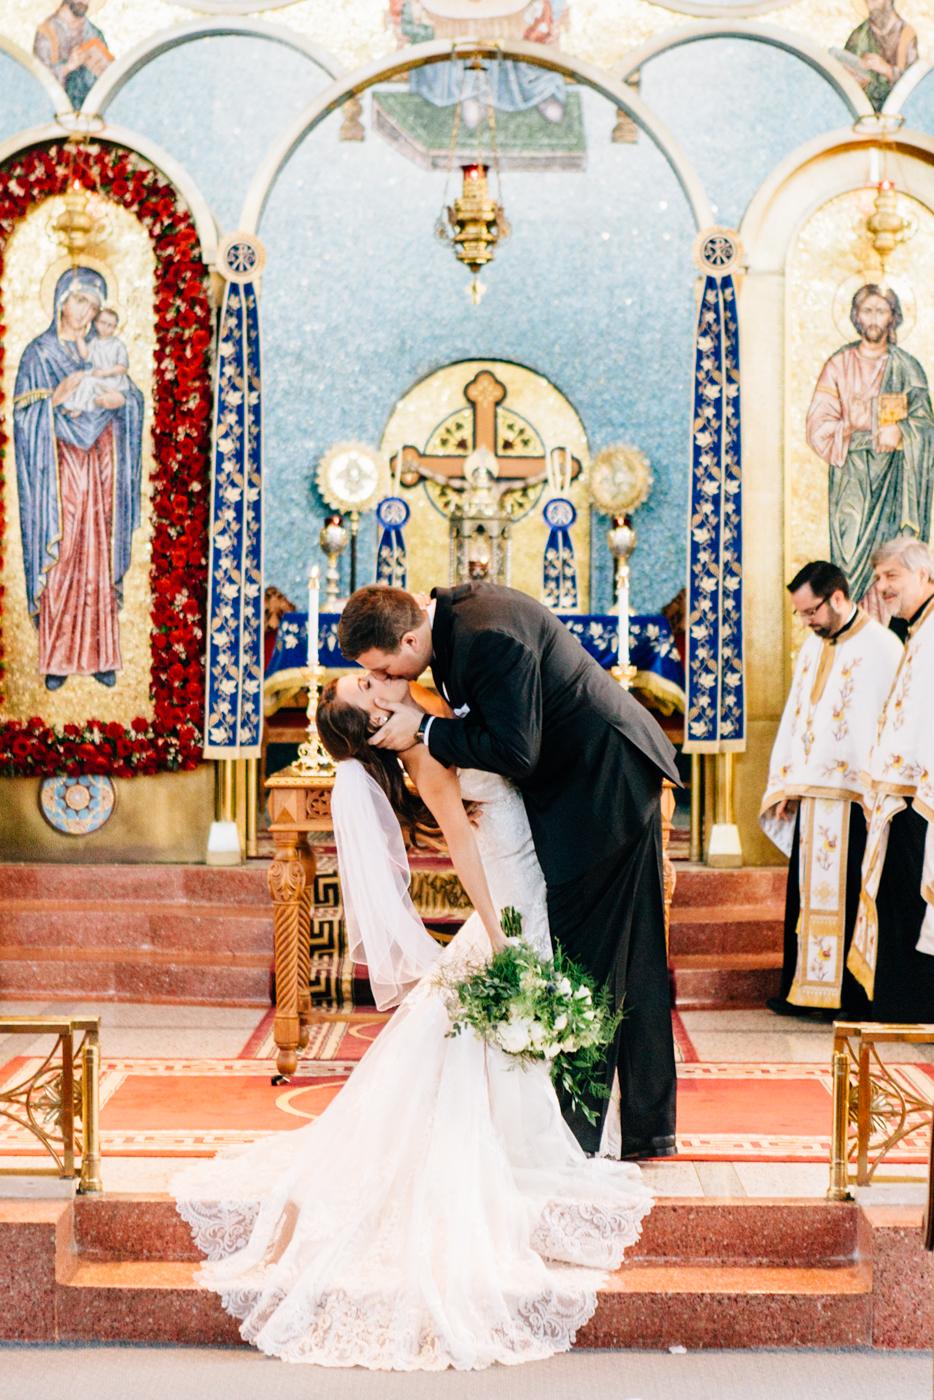 four corners photography greek wedding atlanta greek wedding photographer Annunciation Greek Orthodox Cathedral atlanta wedding photographer (30 of 69).jpg